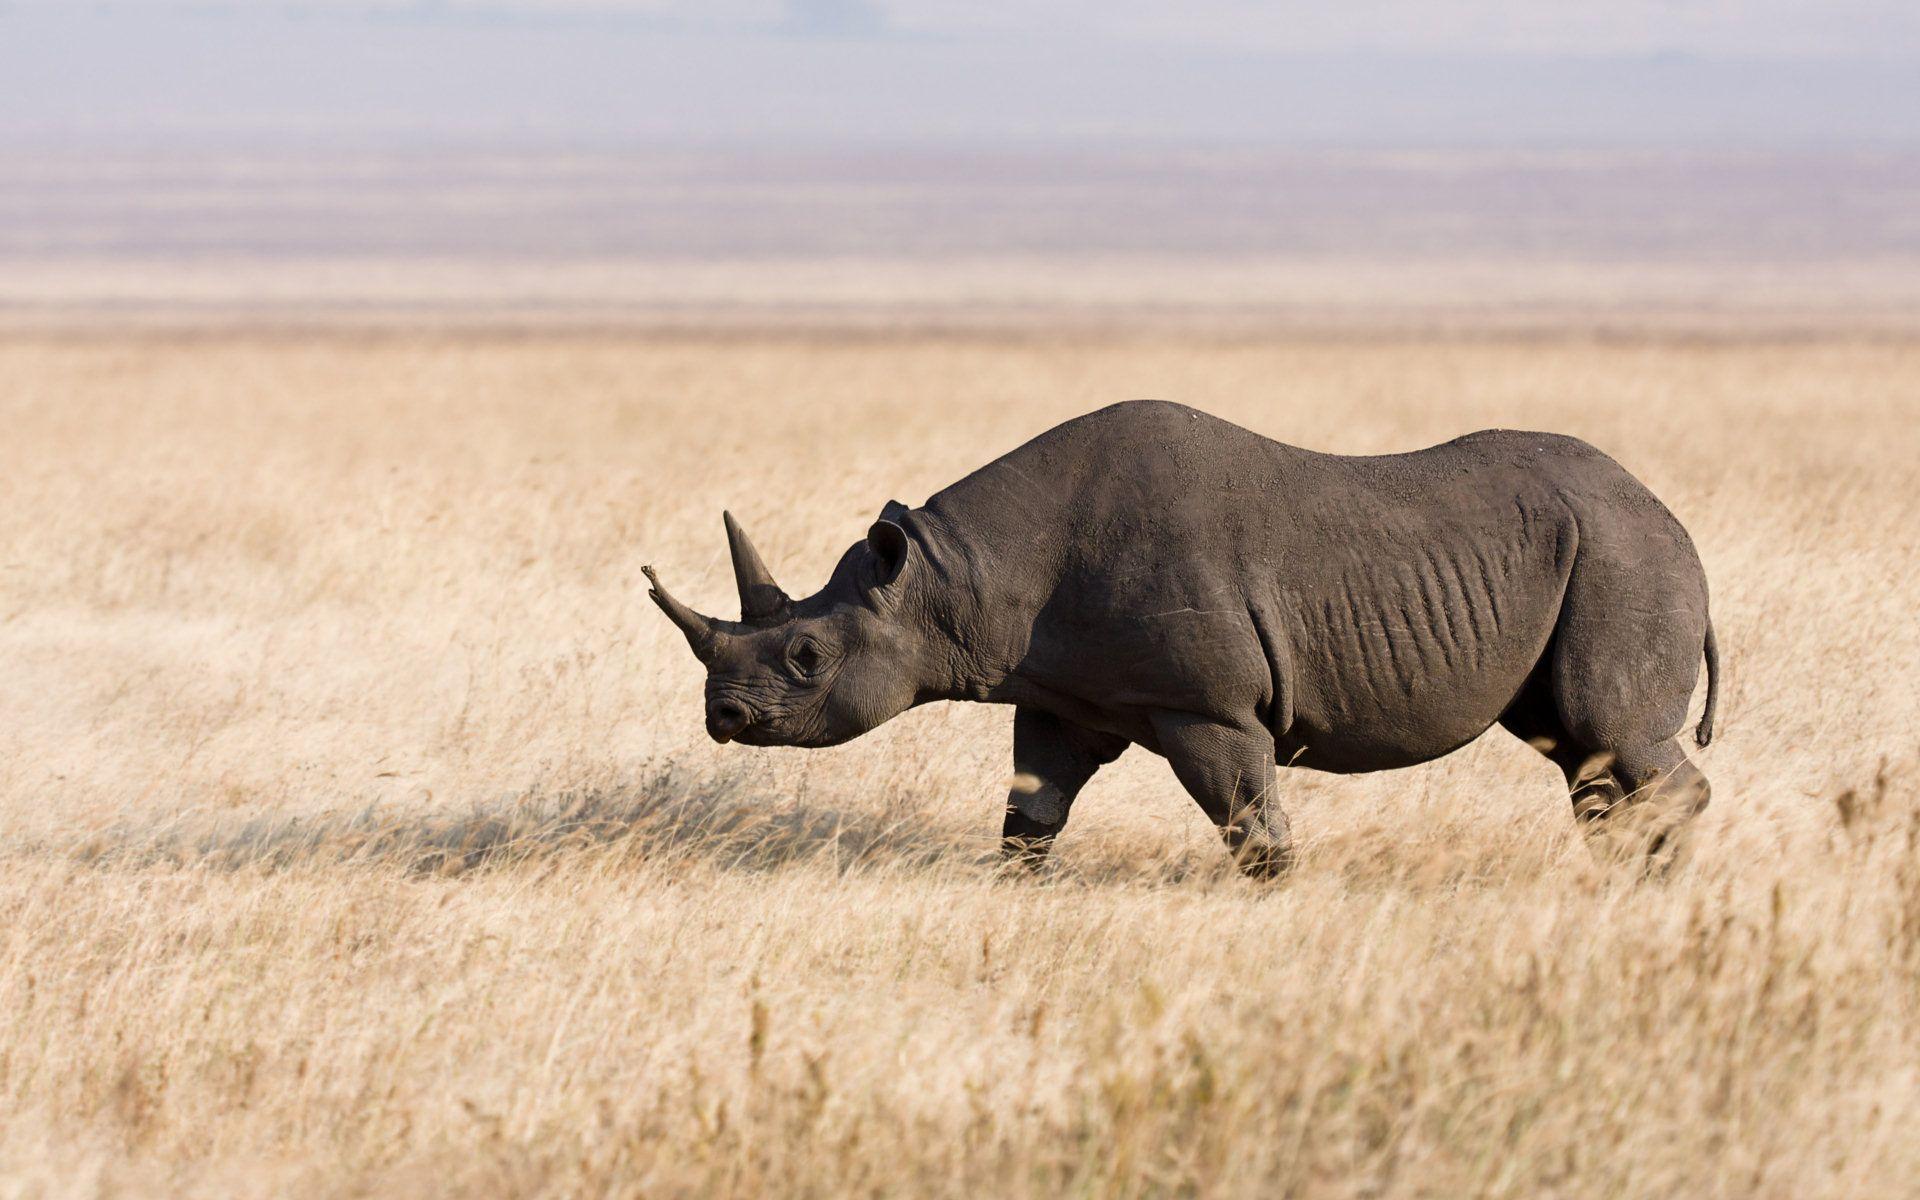 Could Bioprinting Save the Rhino? | 3D Printing News